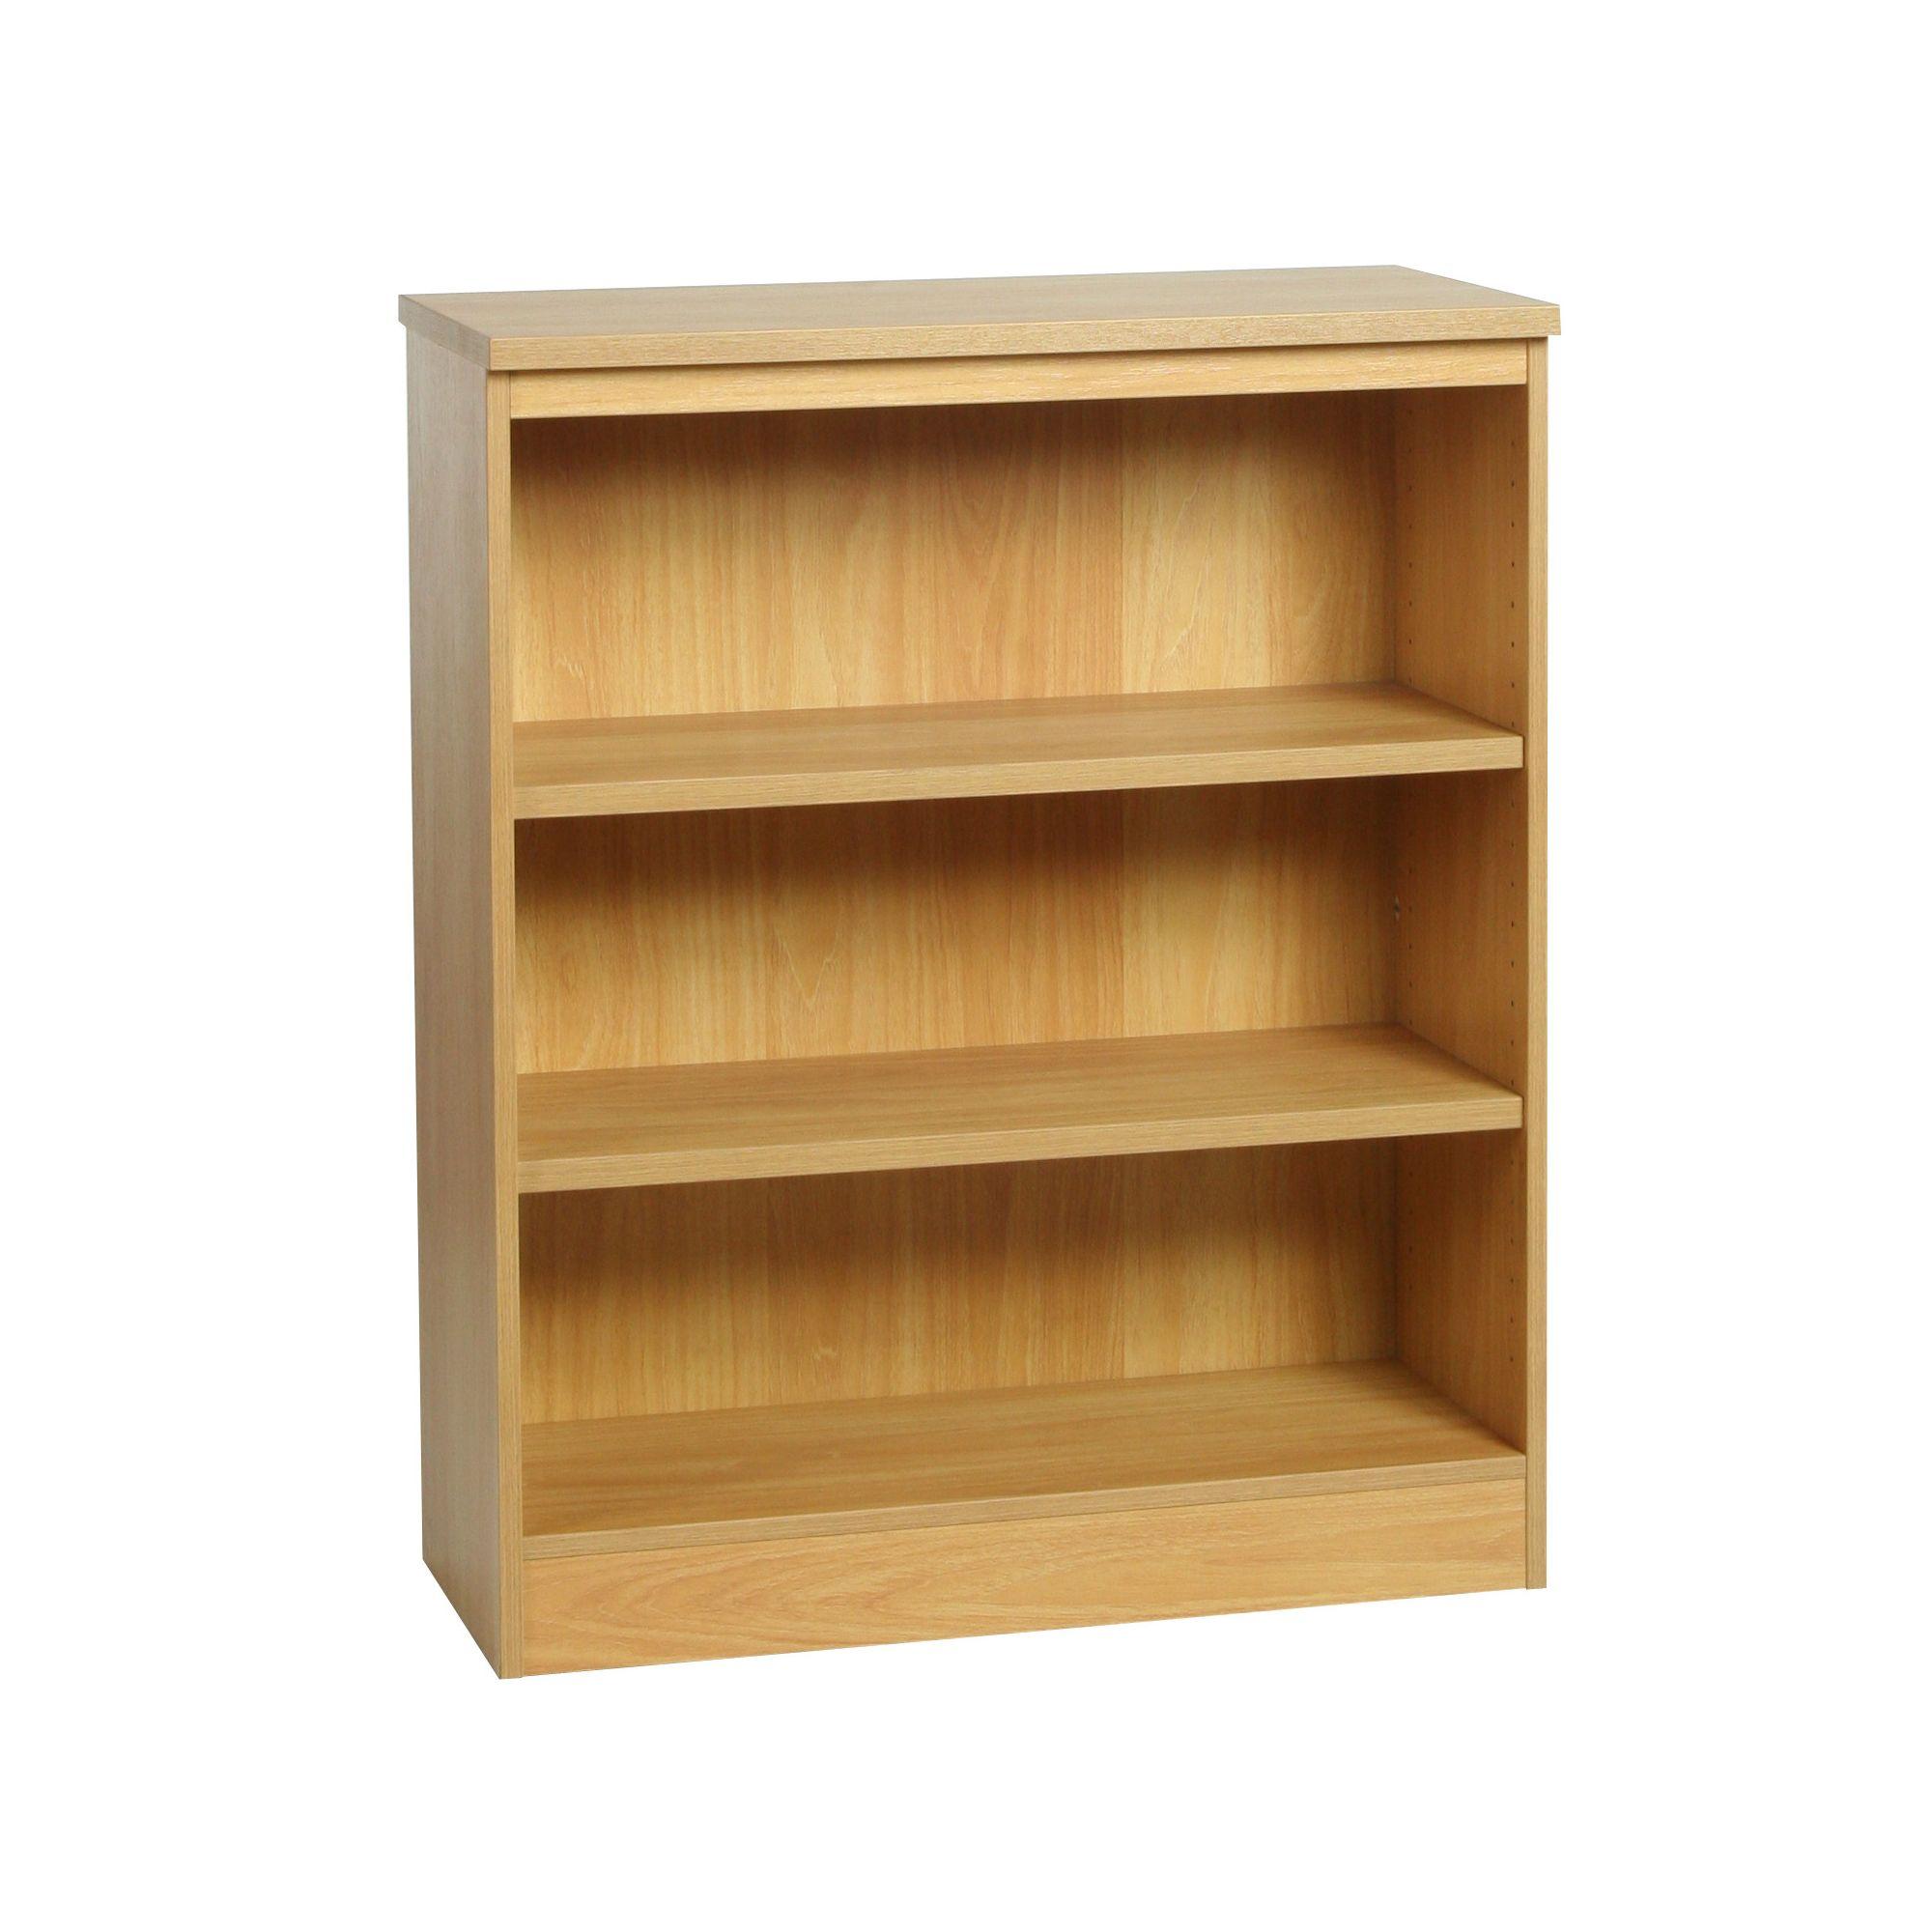 Enduro Three Shelf Wide Bookcase - Warm Oak at Tesco Direct